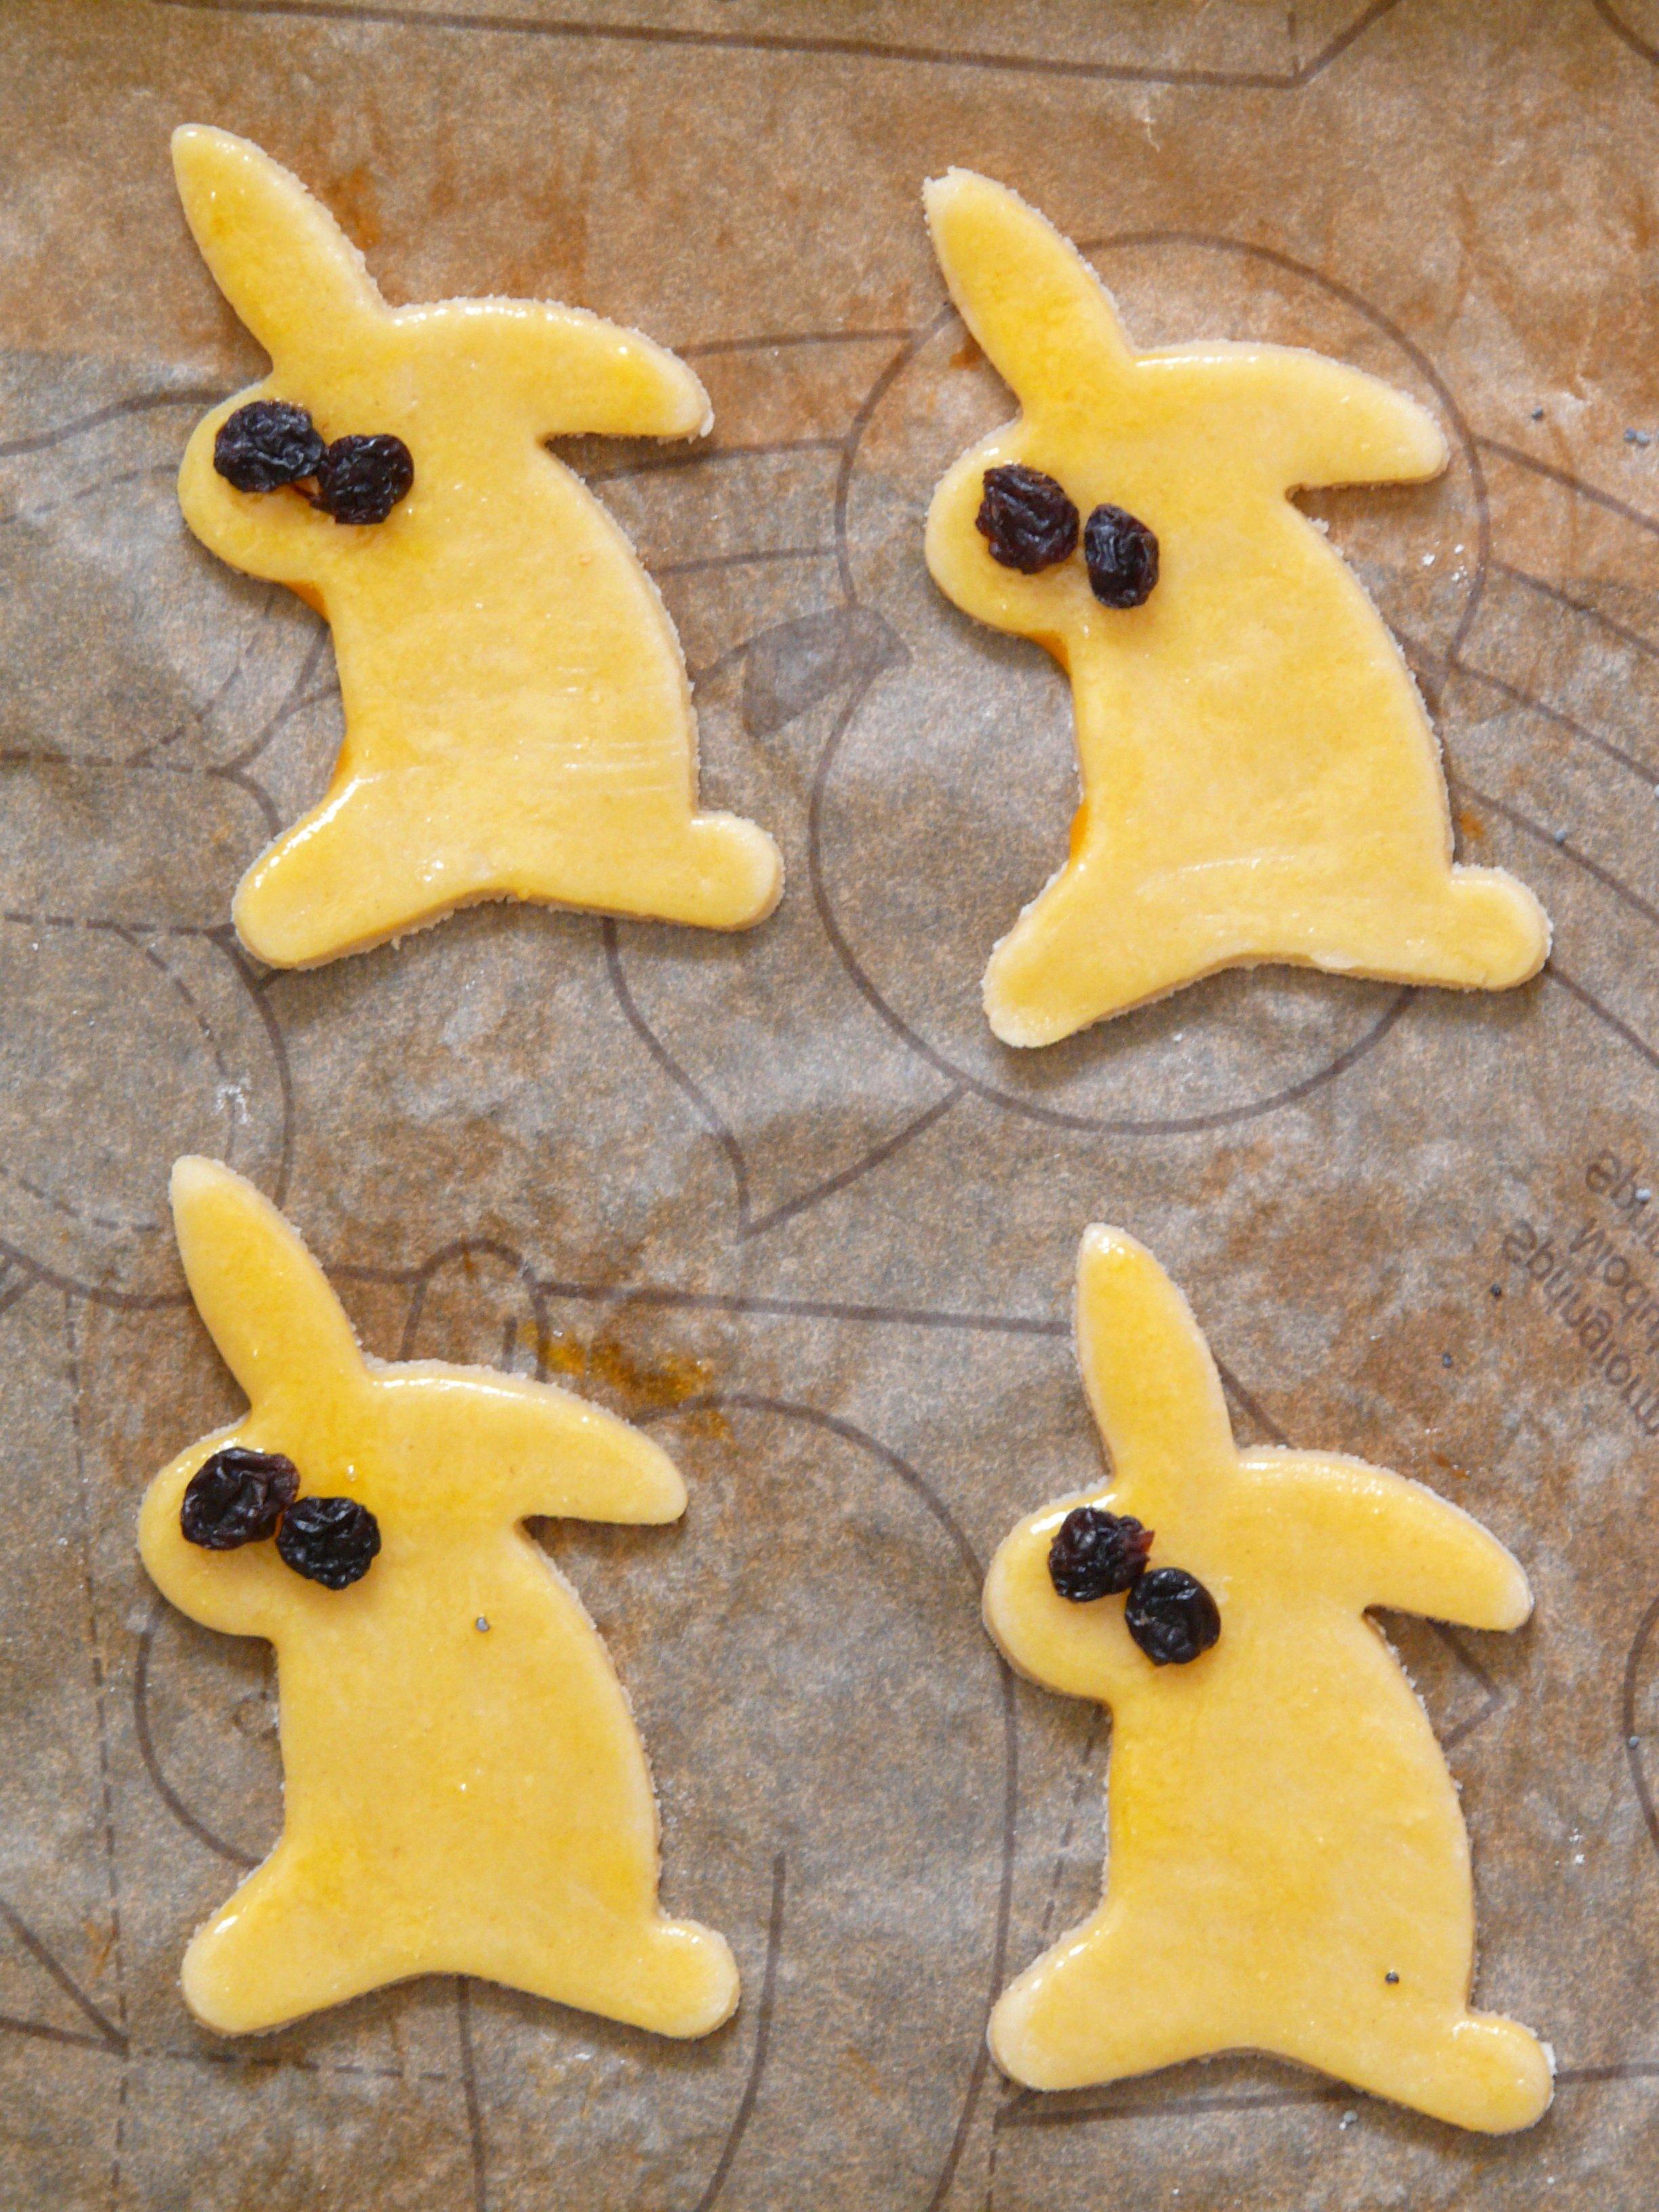 Kostenlose Foto Lebensmittel Produzieren Rezept Gelb Keks